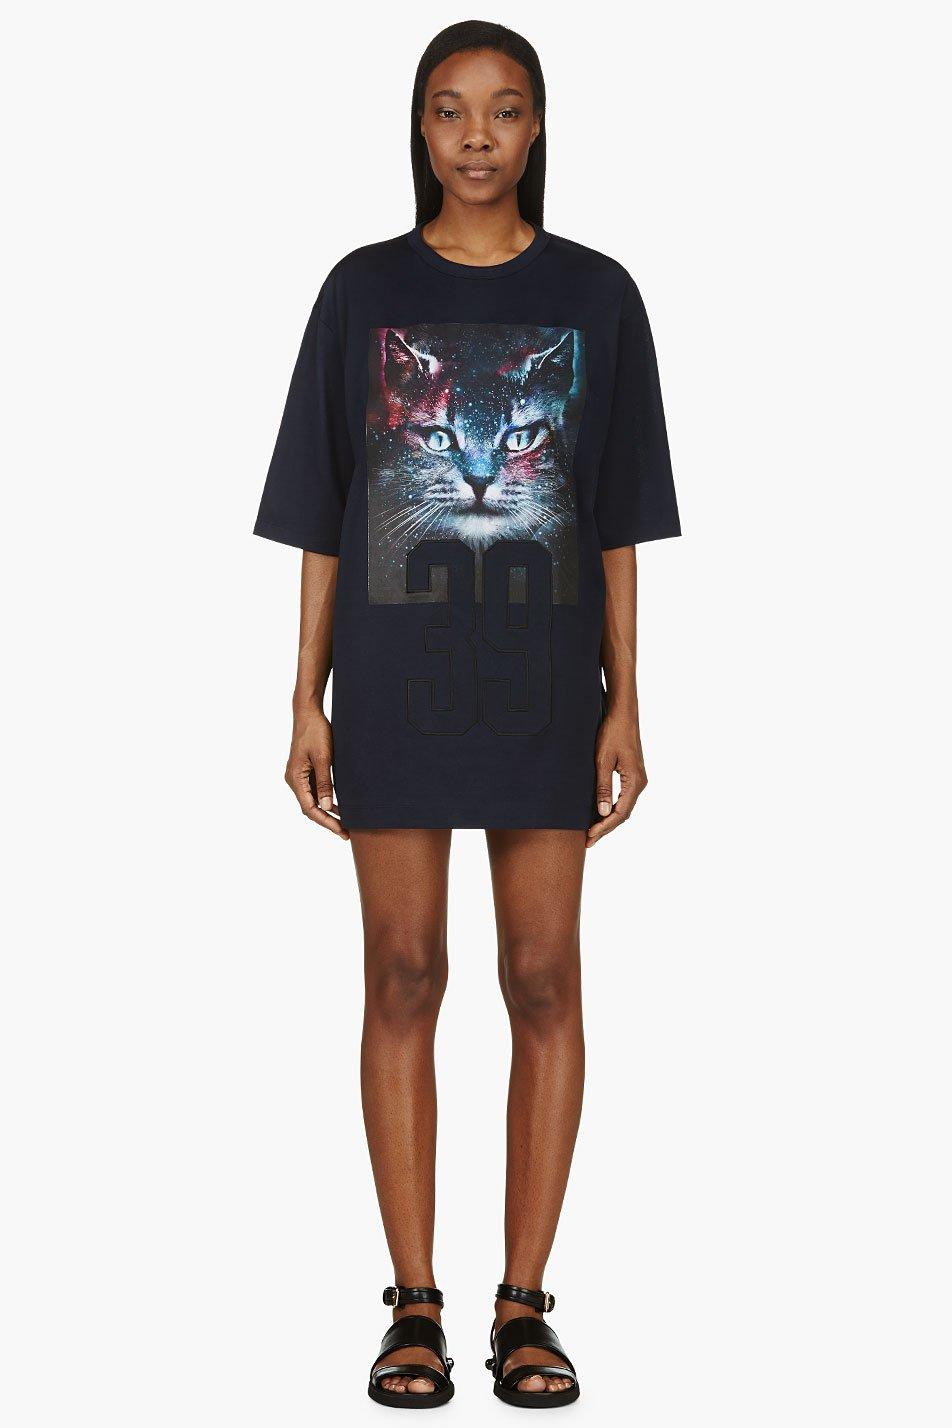 Juun.j ssense exclusive blue and purple cosmic cat t_shirt